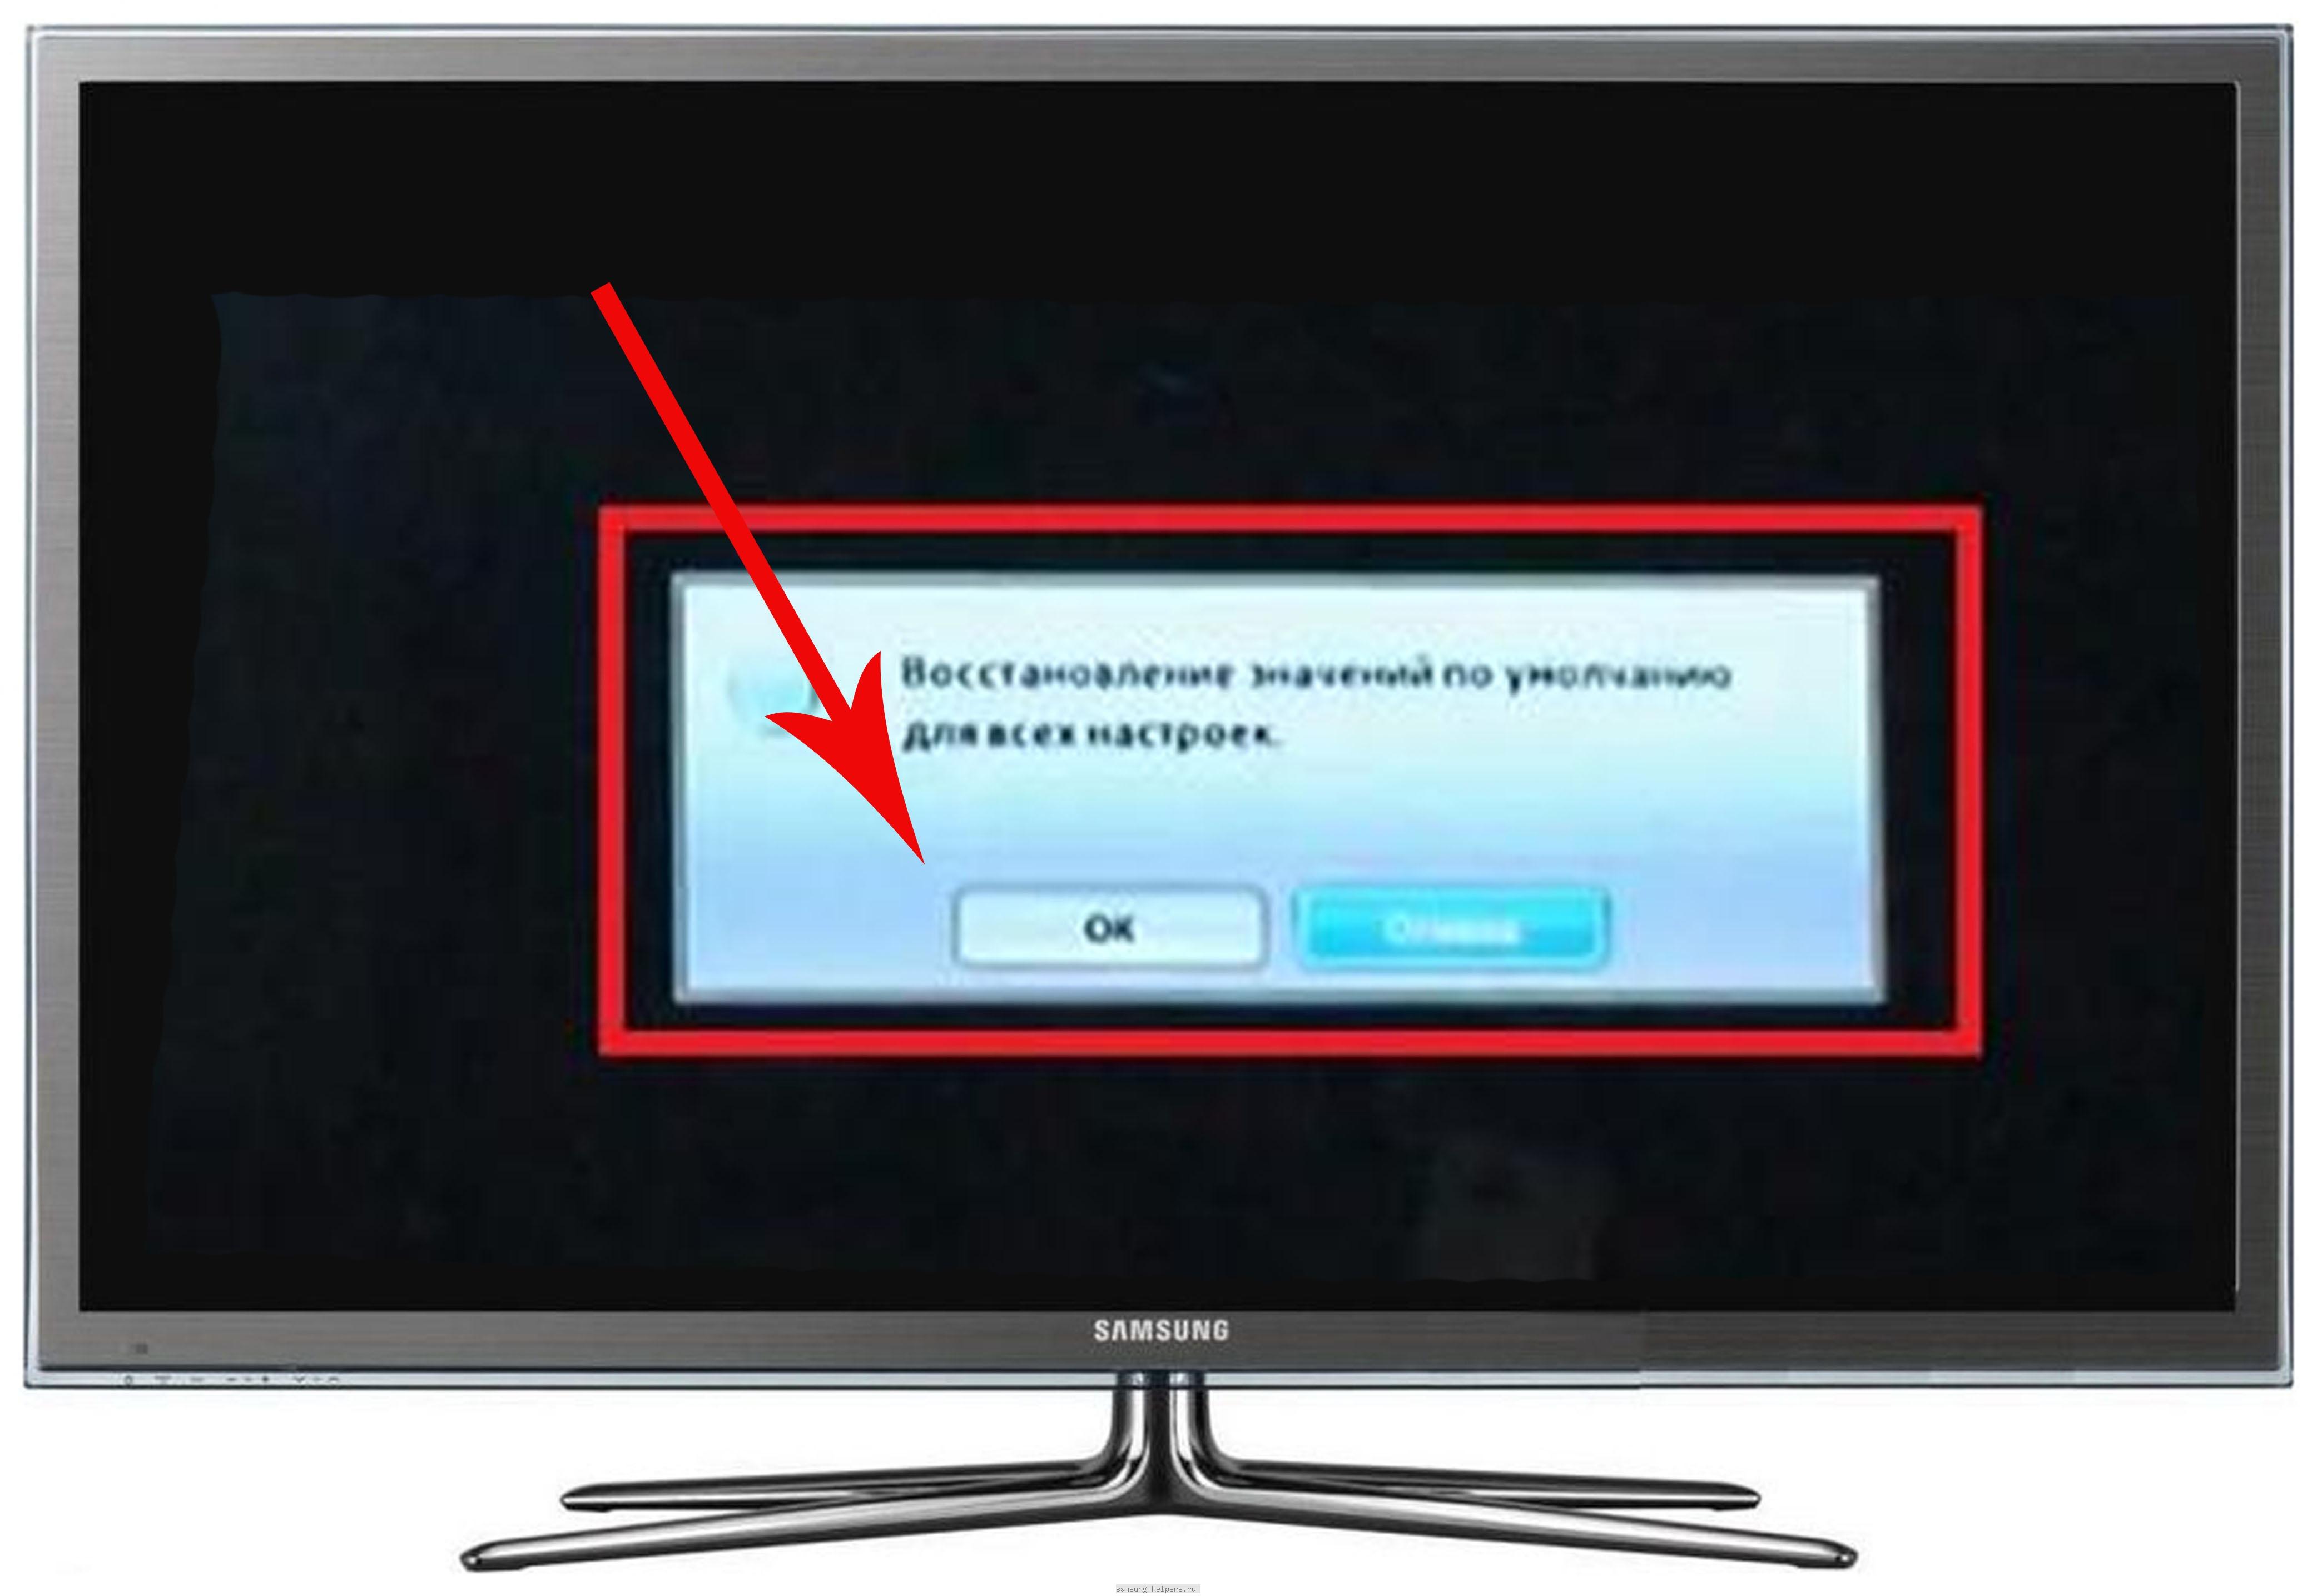 Codes TV samsung universal remotes  Unlock Samsung Smart TV: pin code TV